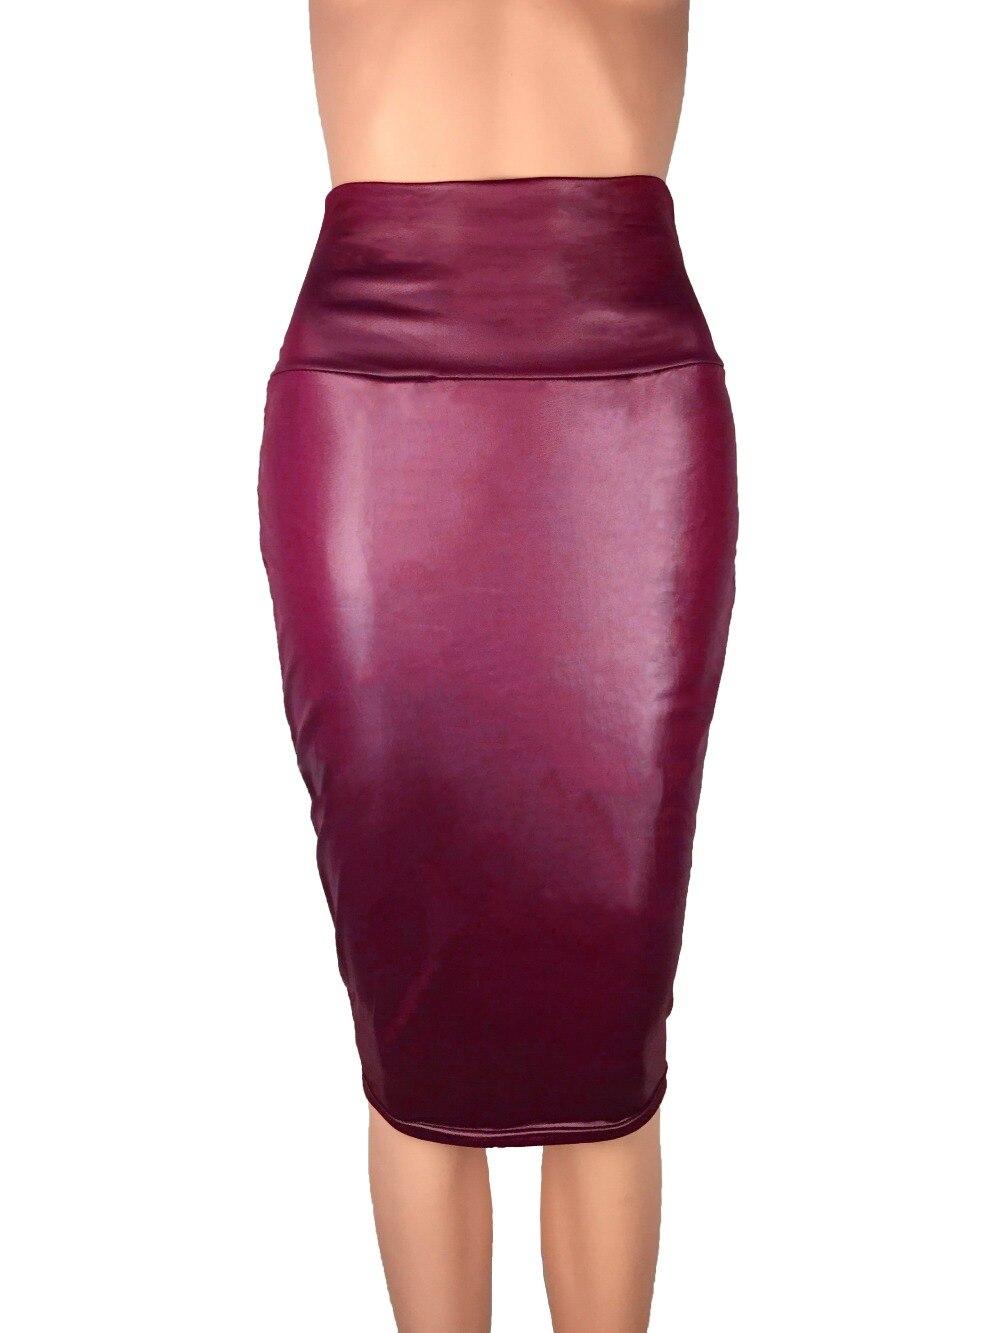 Bohocotol 2018 μολύβι faux δερμάτινη φούστα - Γυναικείος ρουχισμός - Φωτογραφία 4